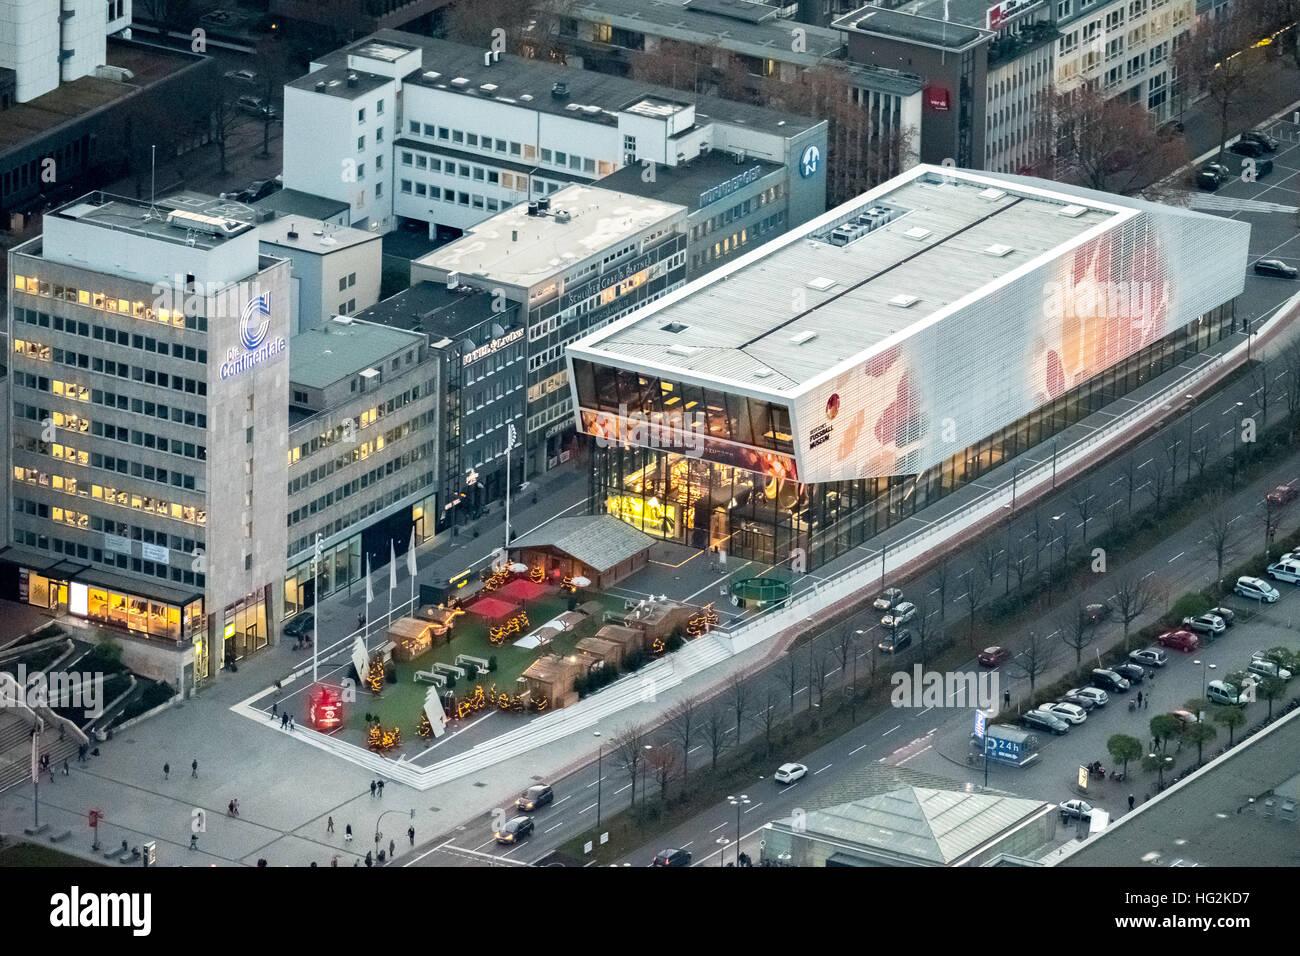 Aerial view, DFB Football Museum Dortmund at night, Football Museum, Dortmund, Ruhr aeria, north rhine-westphalia, Stock Photo